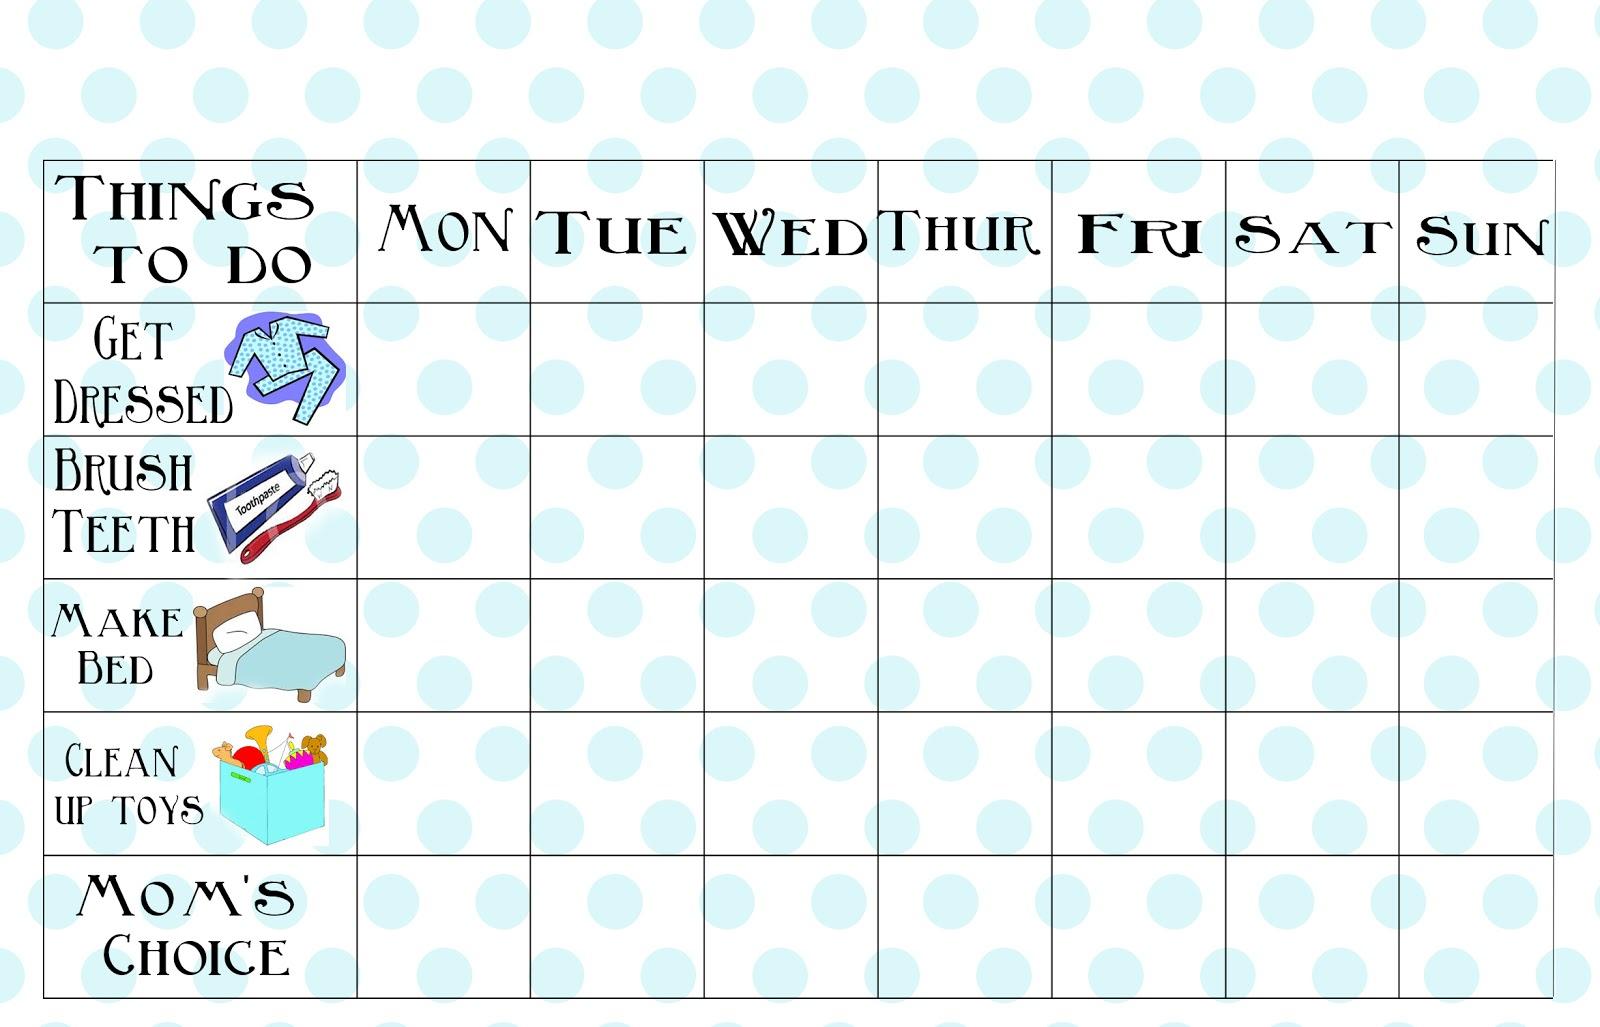 photo regarding Printable Kids Chore Chart named Totally free Printable Chore Chart